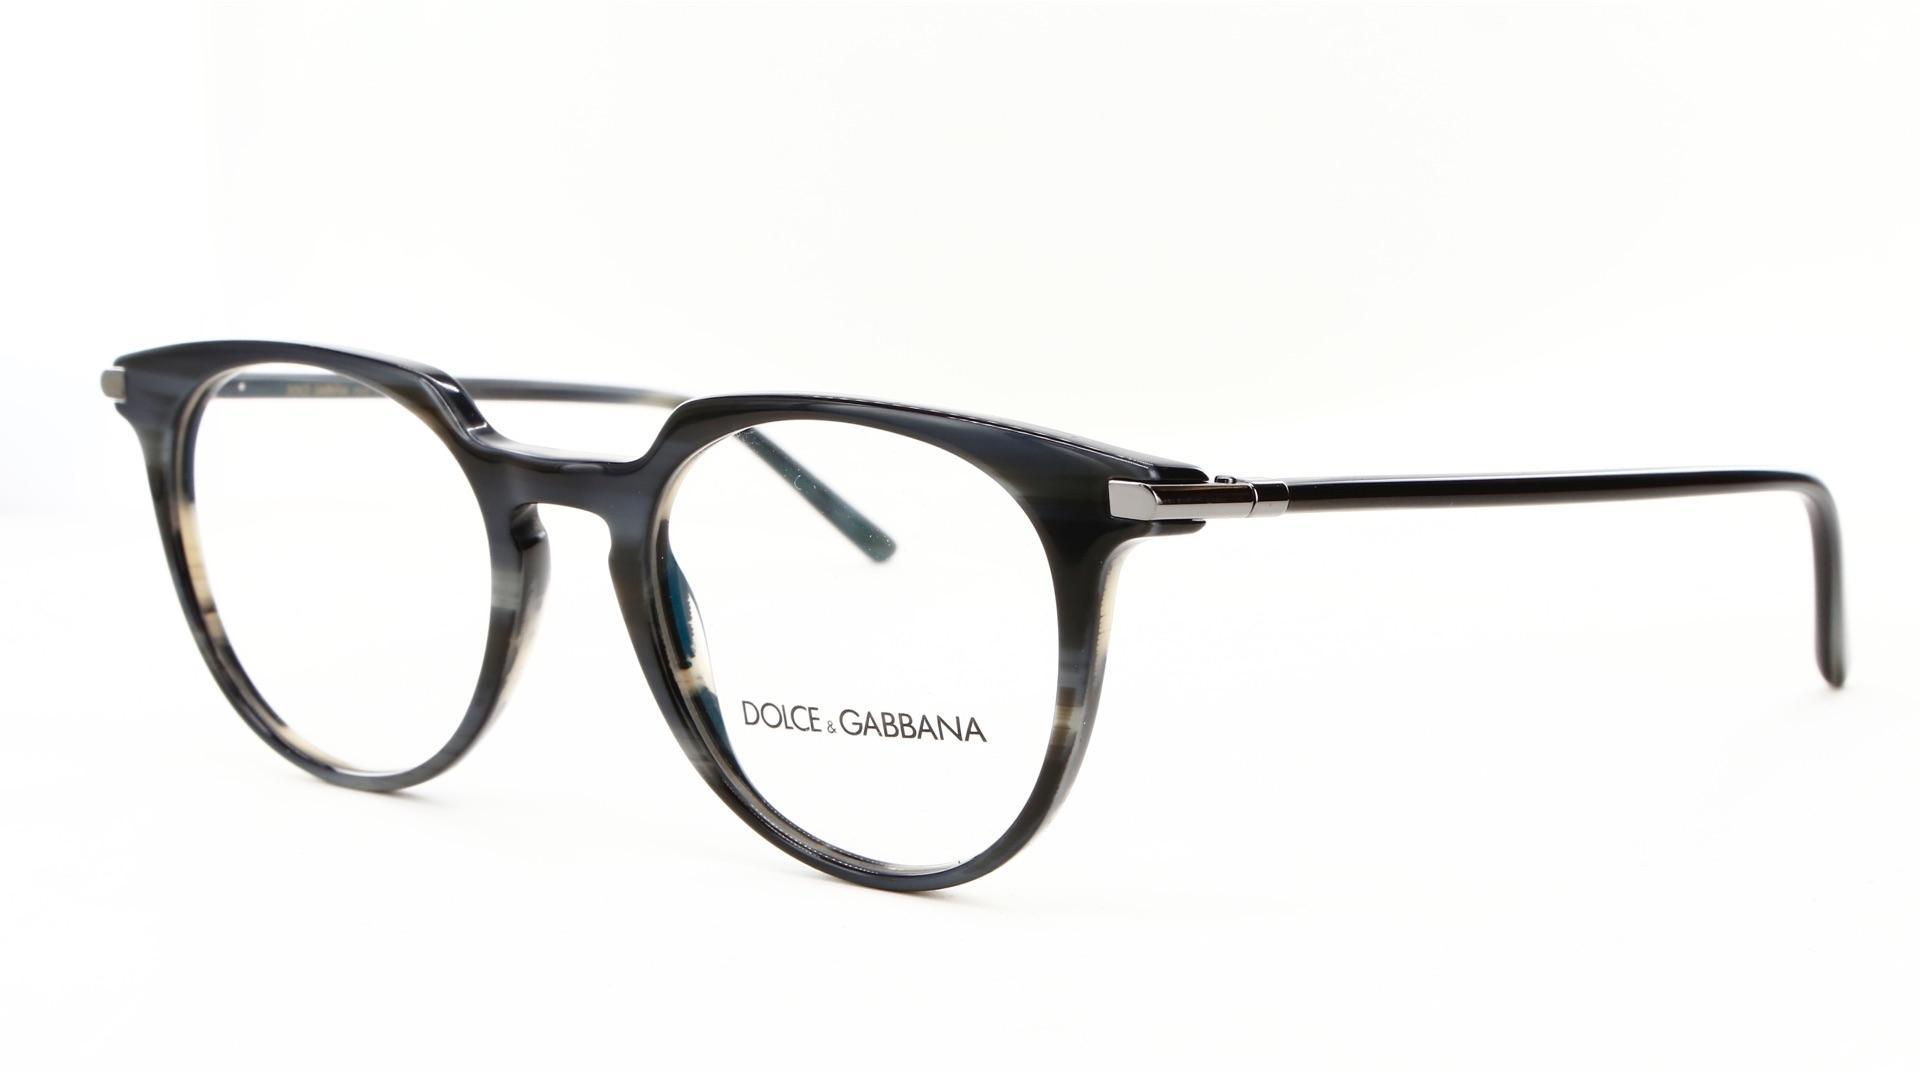 Dolce & Gabbana - ref: 80751